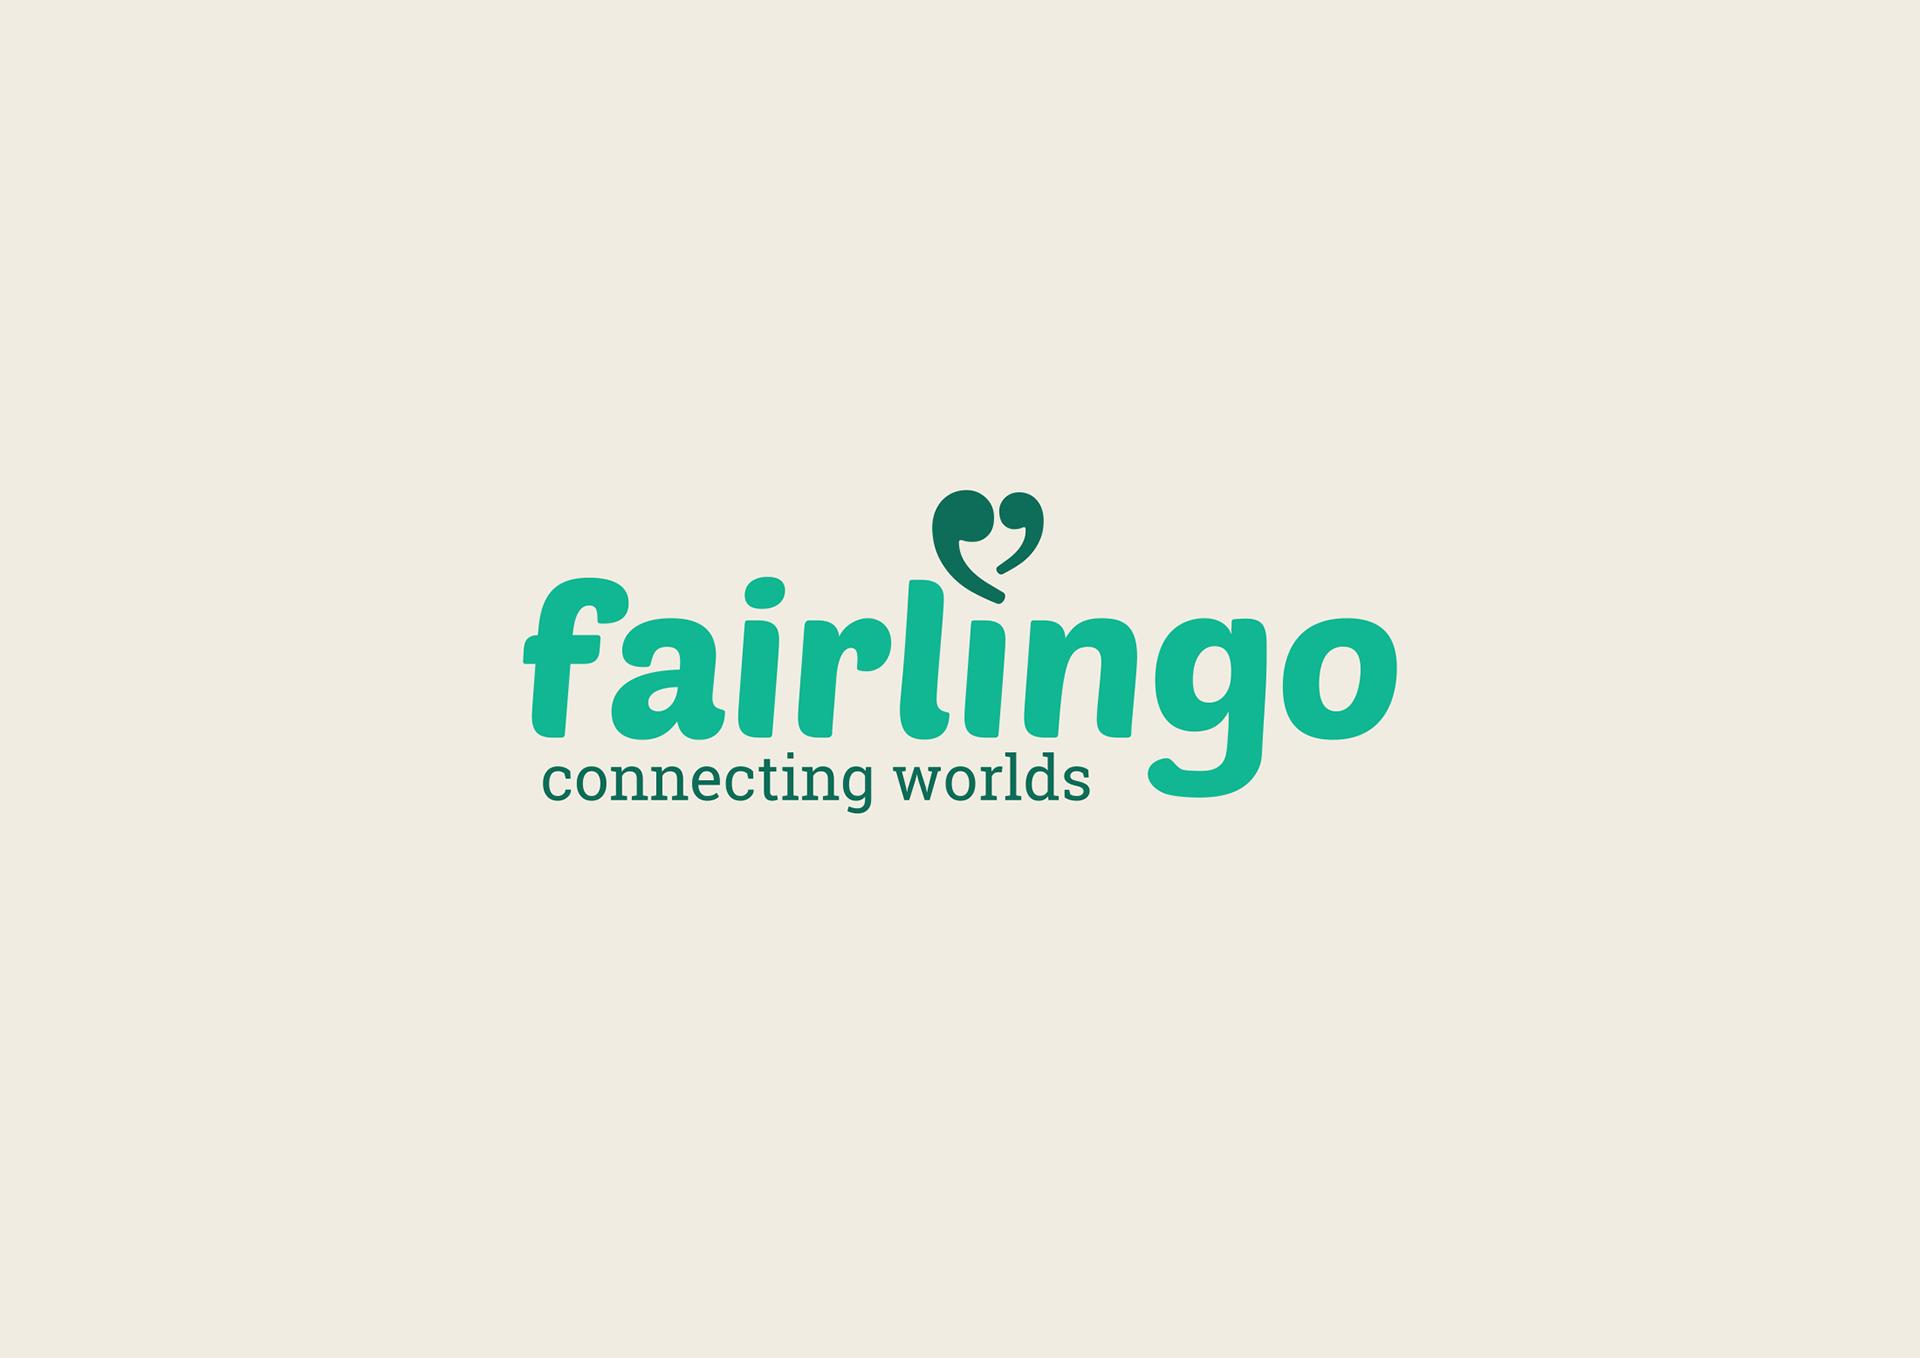 Fairlingo main logo